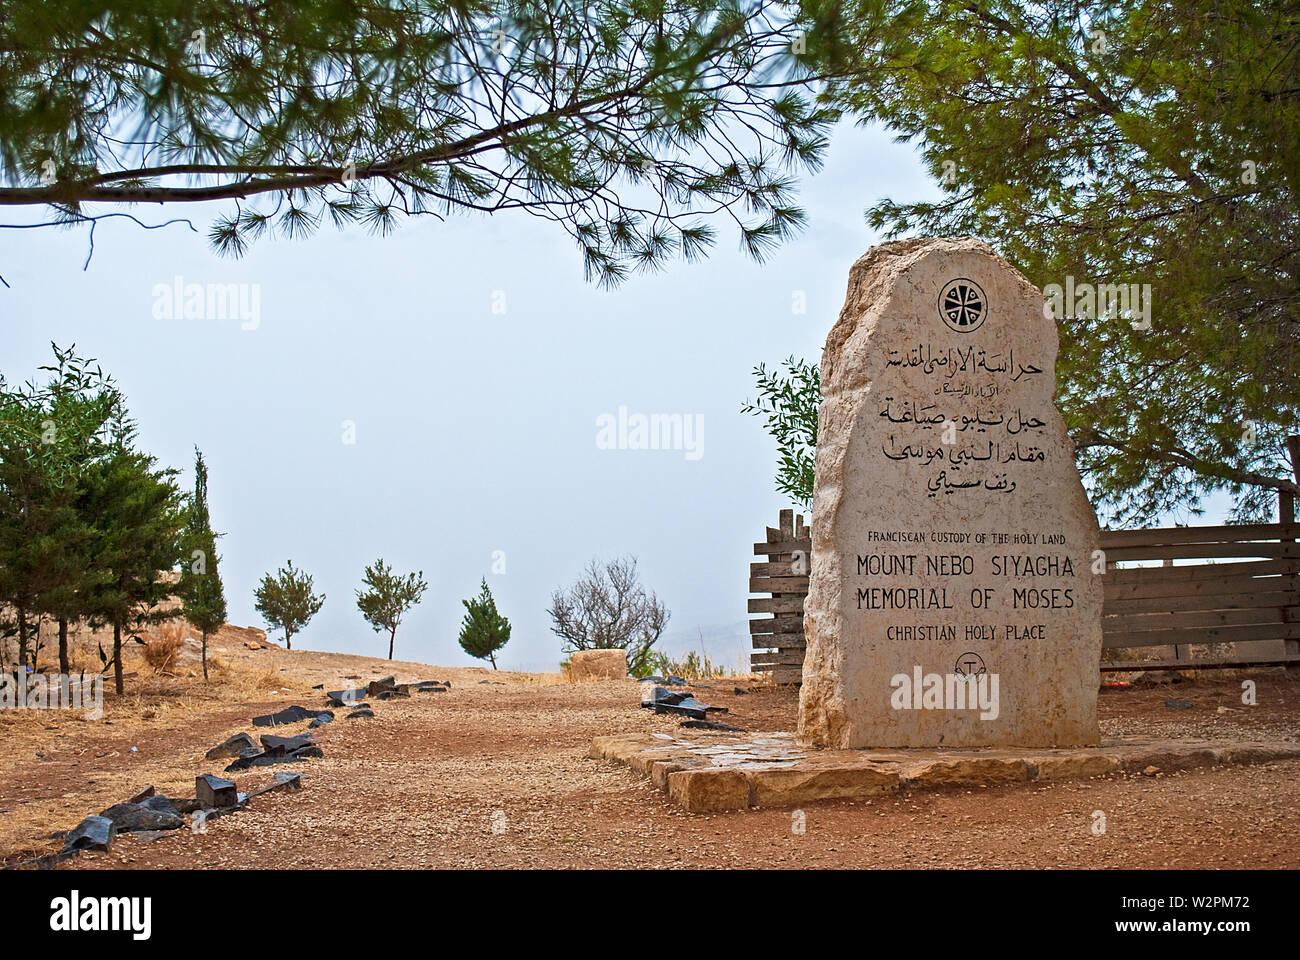 Stone Mount Nebo Siyagha Memorial of Moses, Christian holy place, Jordan. Stock Photo